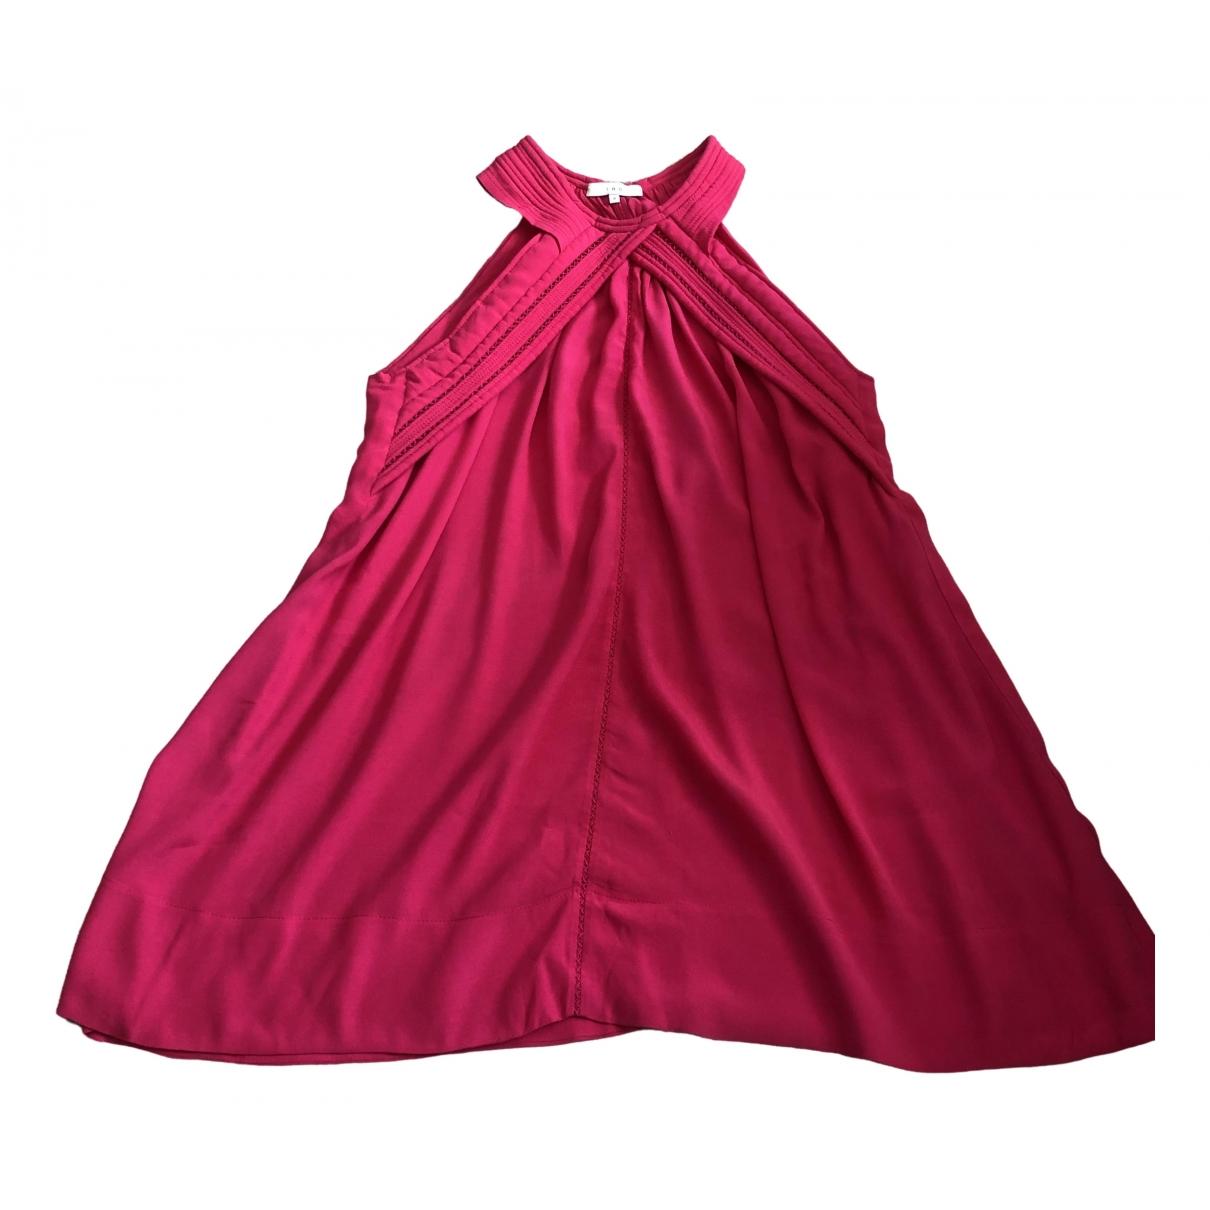 Iro \N Pink dress for Women 38 FR